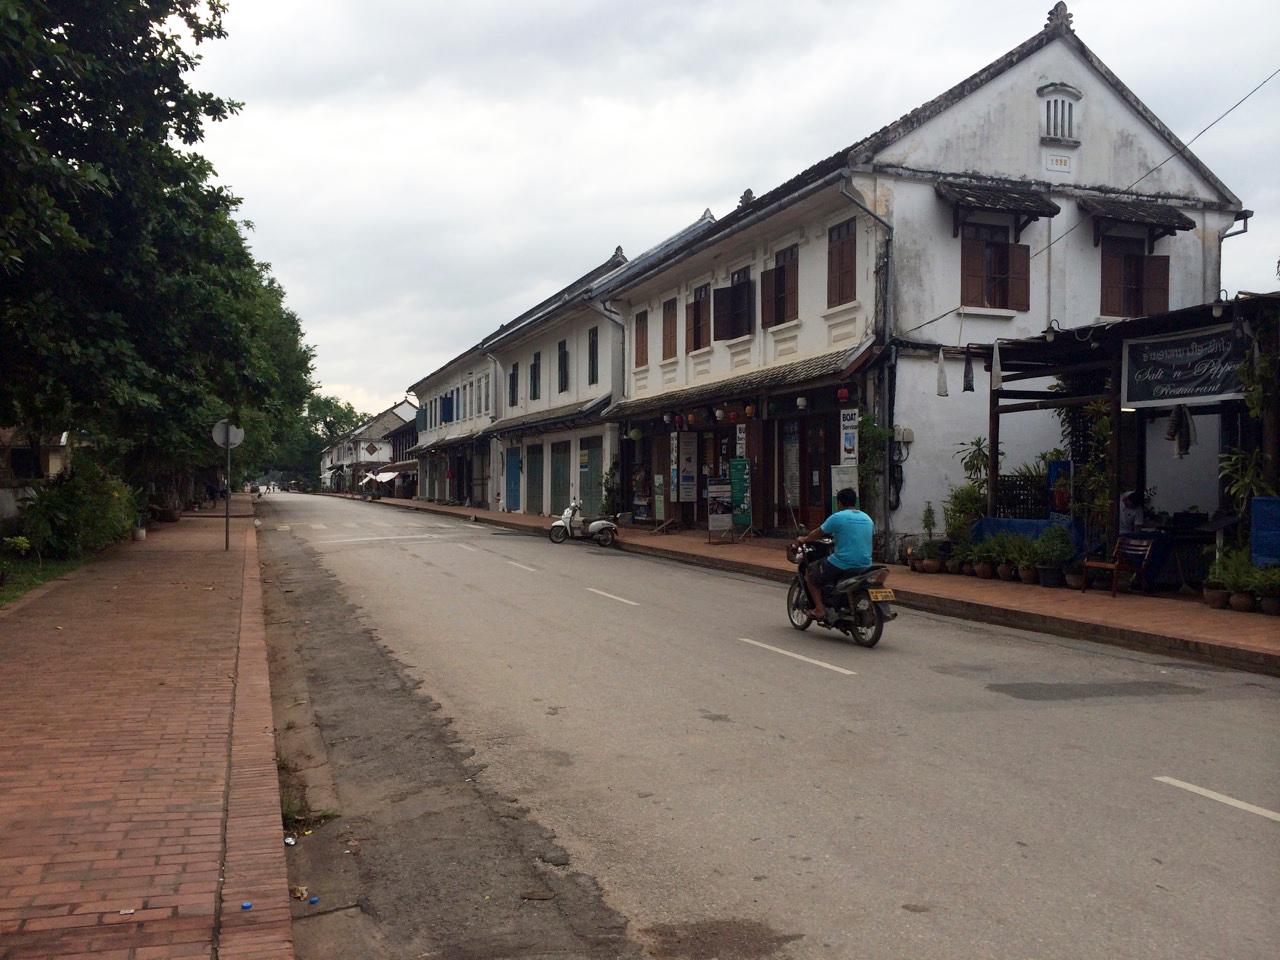 Путешествие по Лаосу: улицы Луанг Прабанга